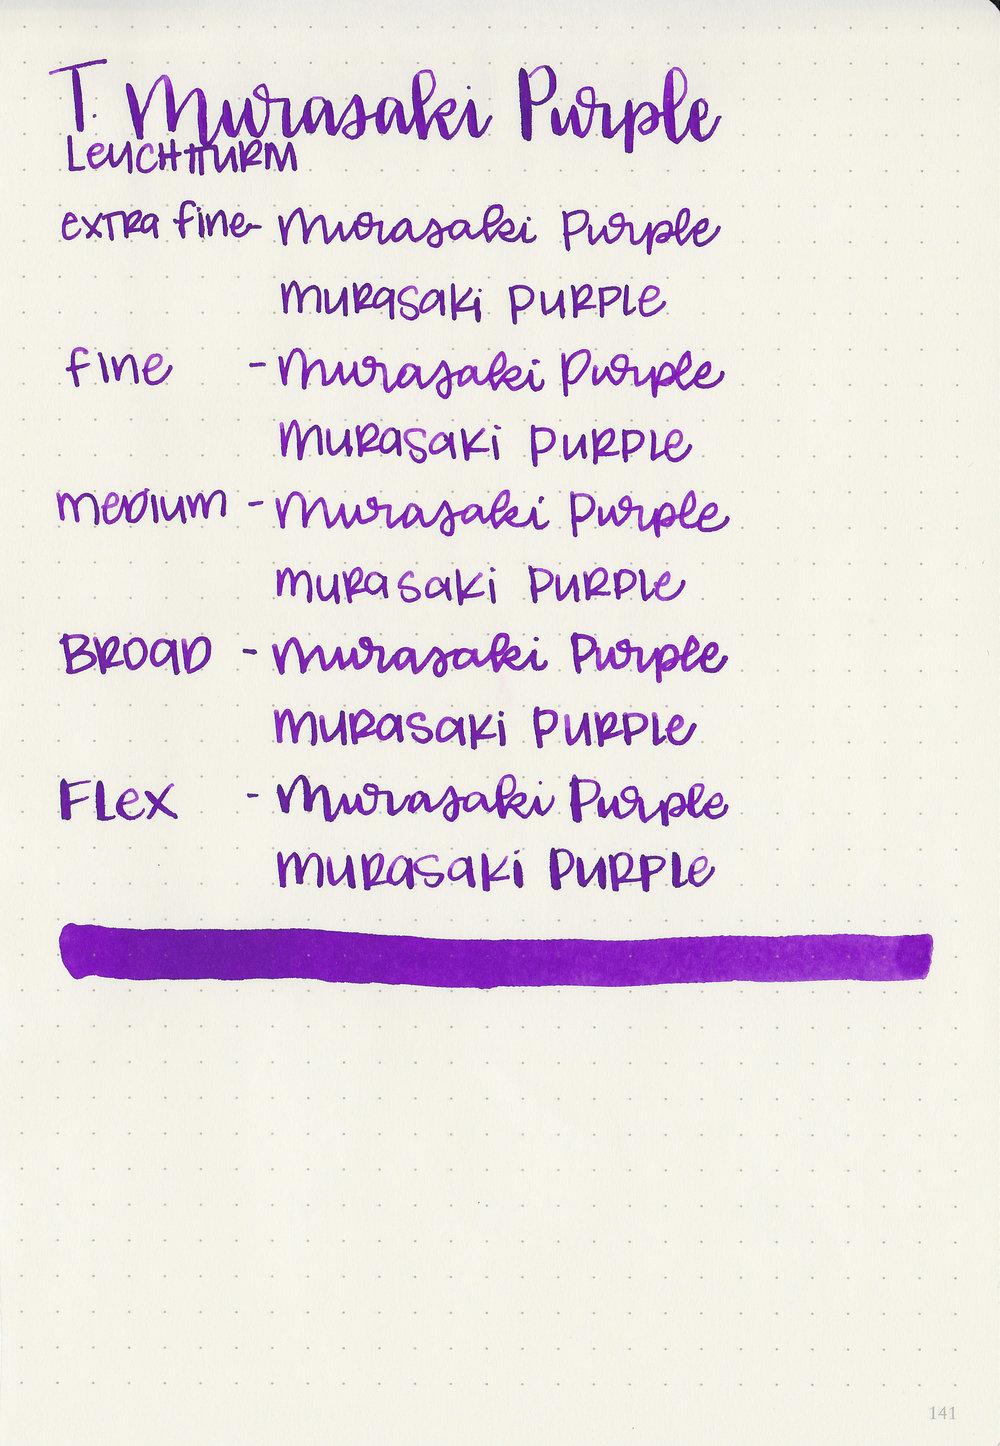 tac-murasaki-purple-11.jpg